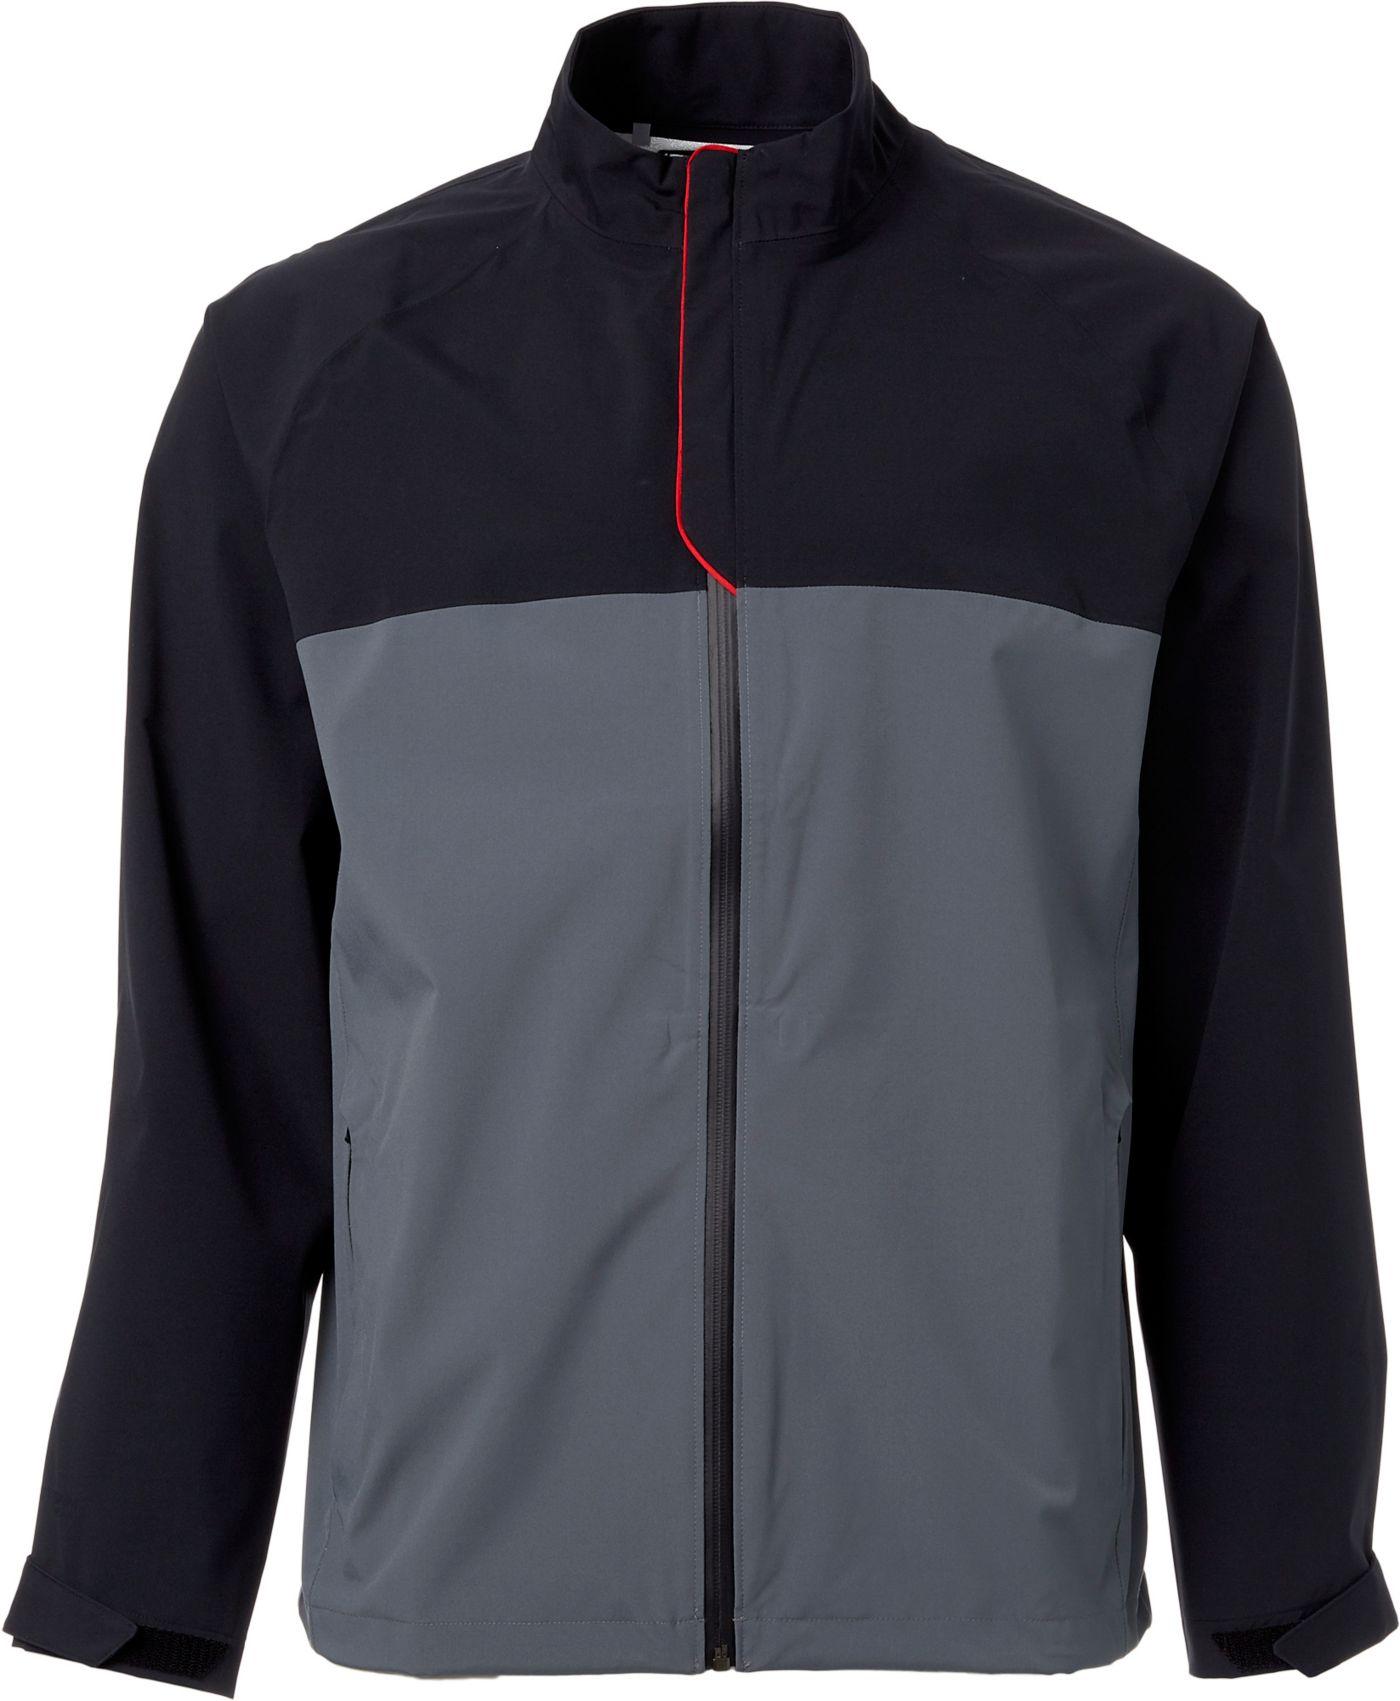 Under Armour Men's Elements Golf Rain Jacket